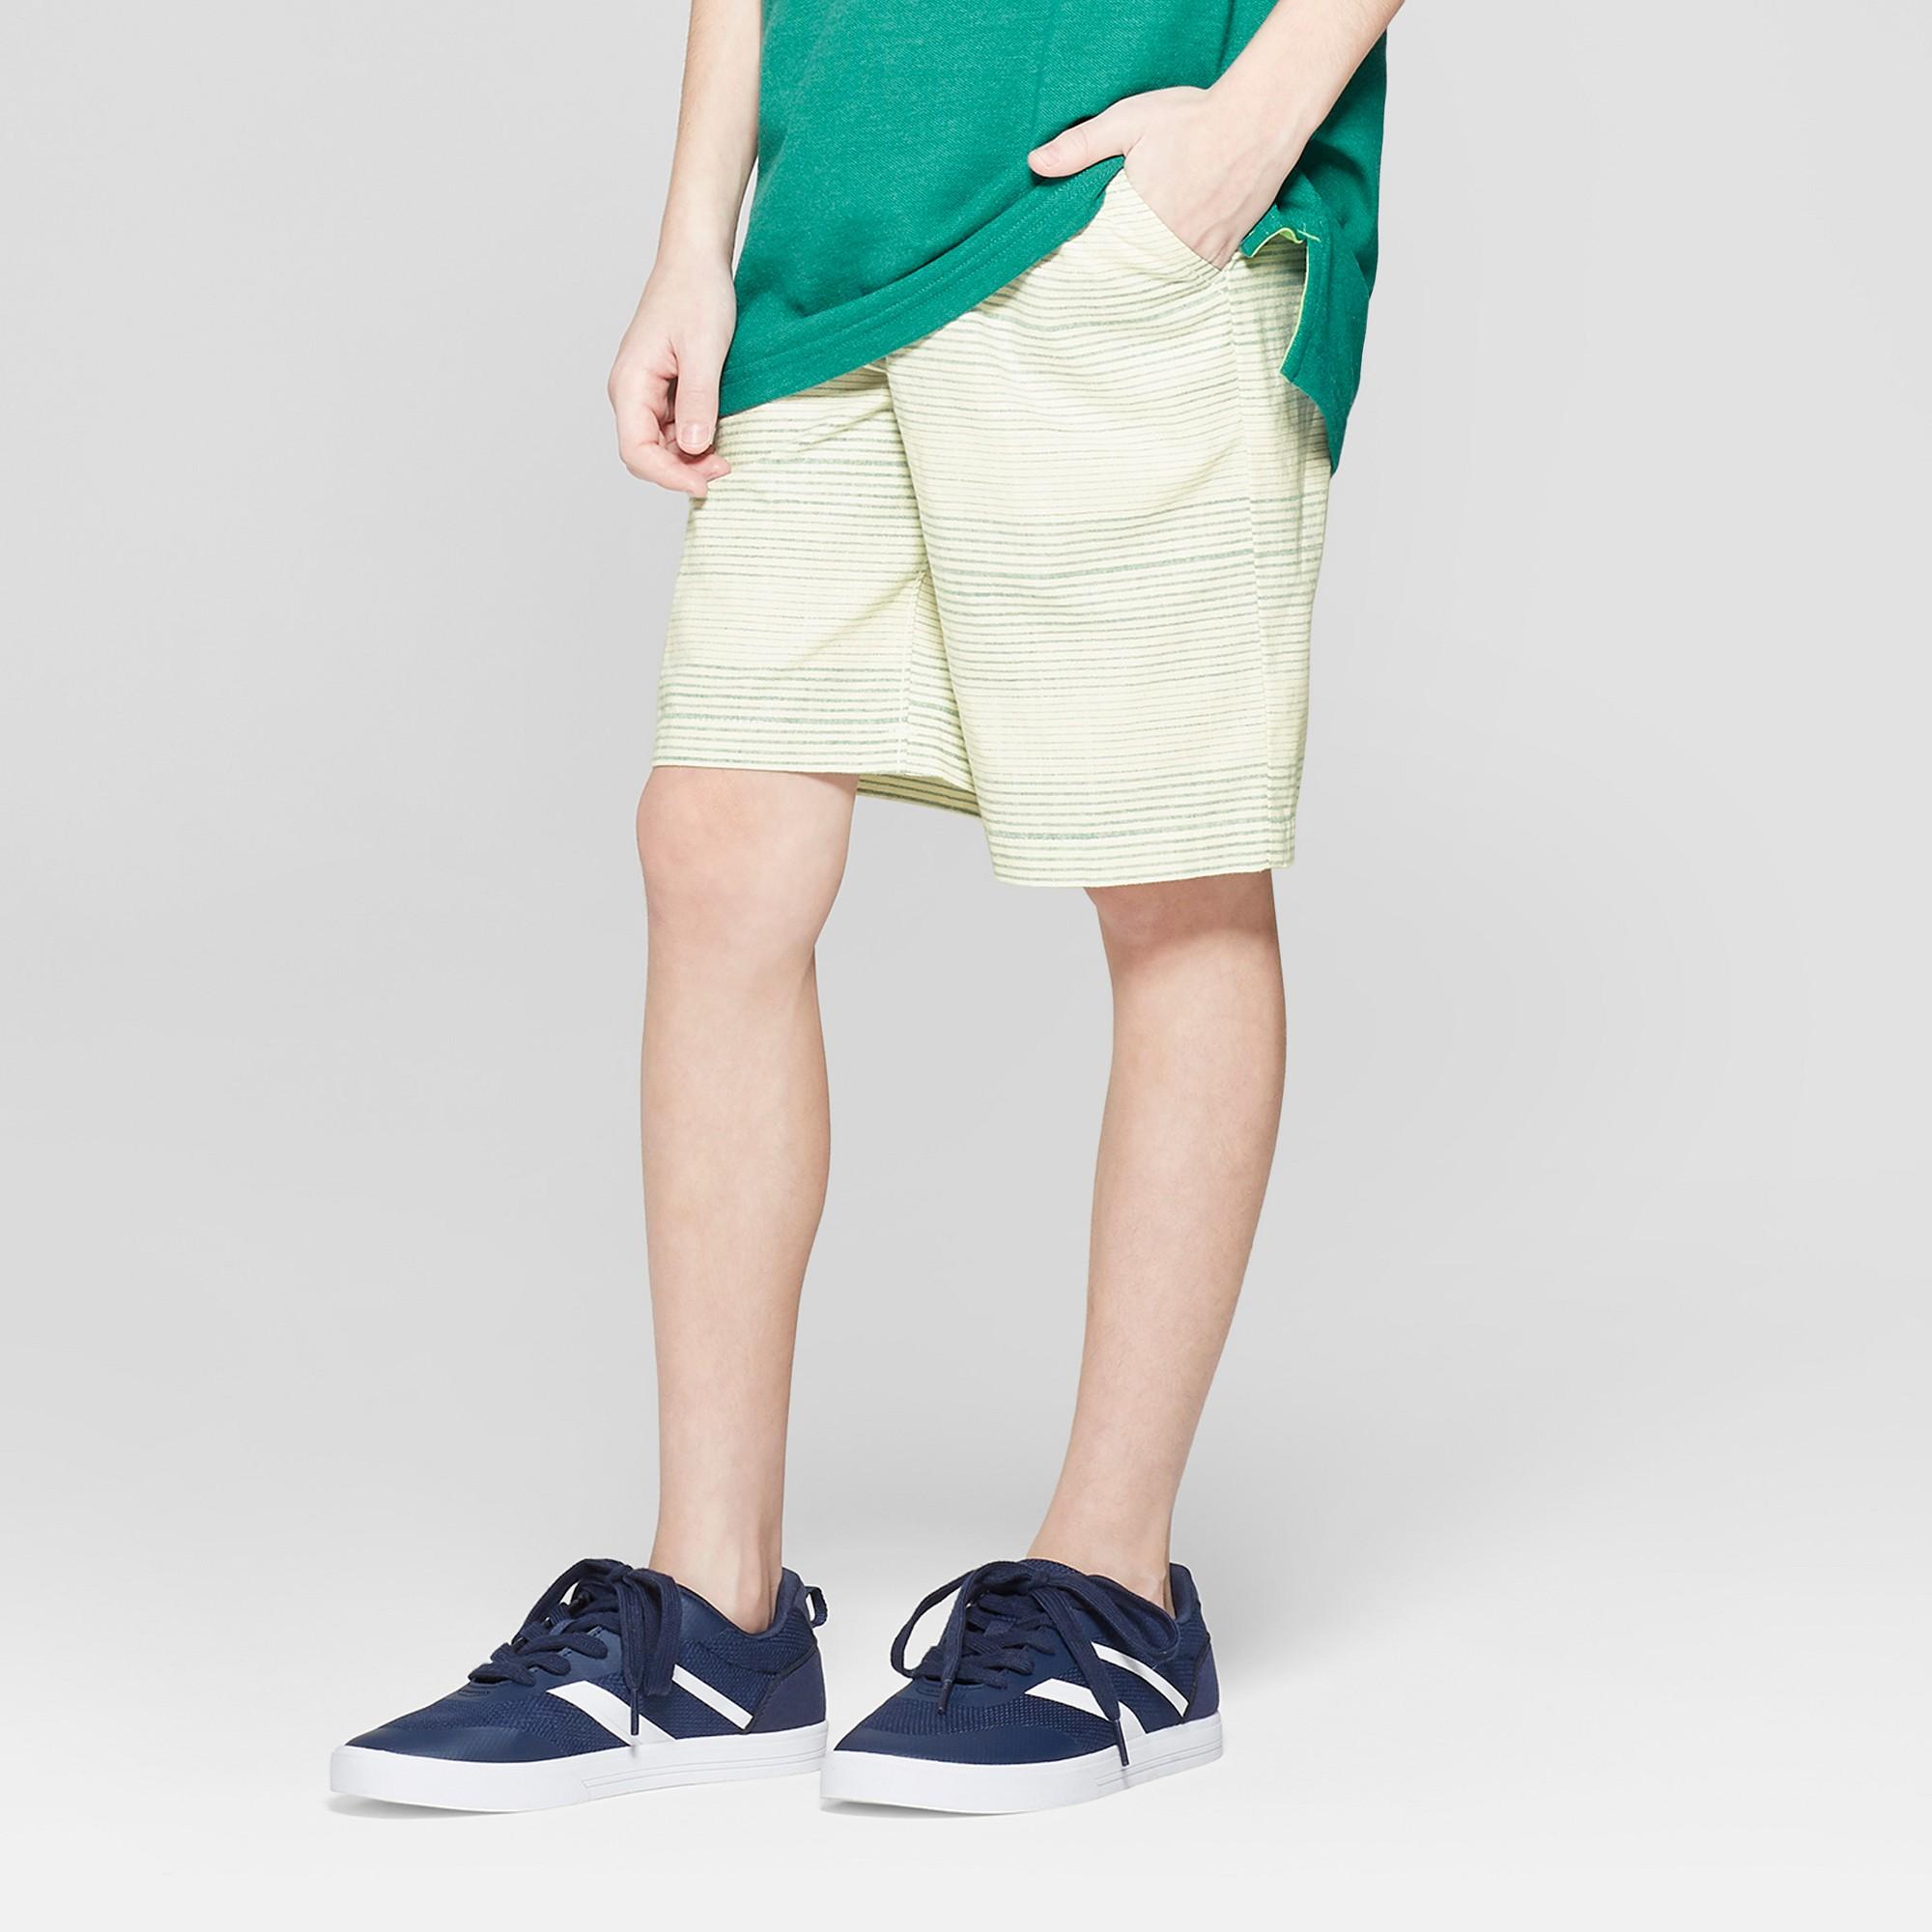 Boys' Striped Pull-On Shorts - Cat & Jack Light Green Xxl